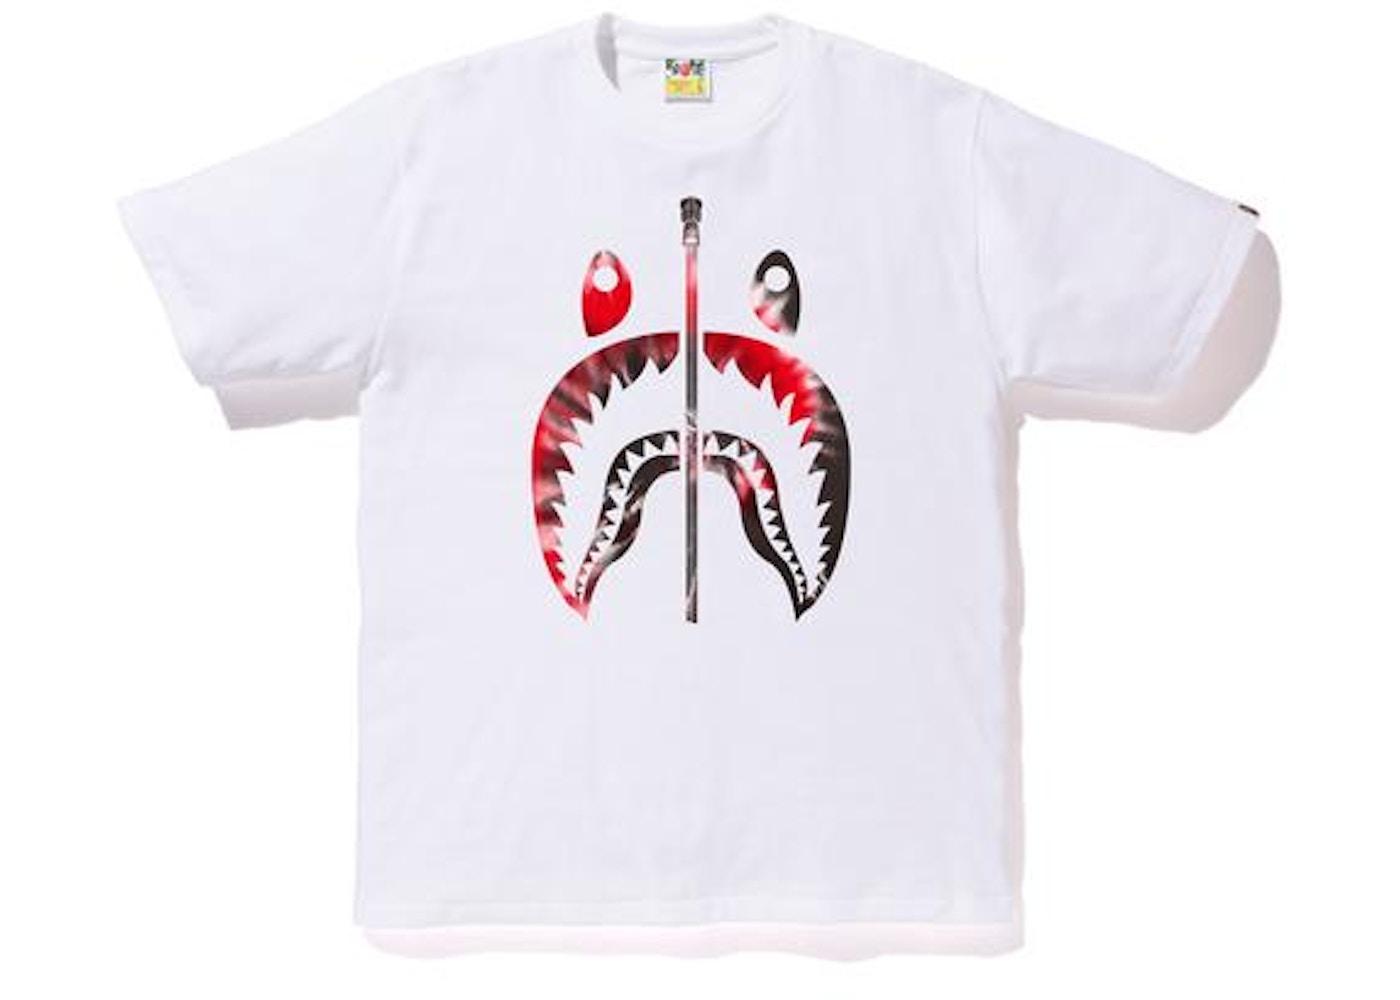 48749d1ccb6f BAPE Tie Dye Shark Tee White Red -